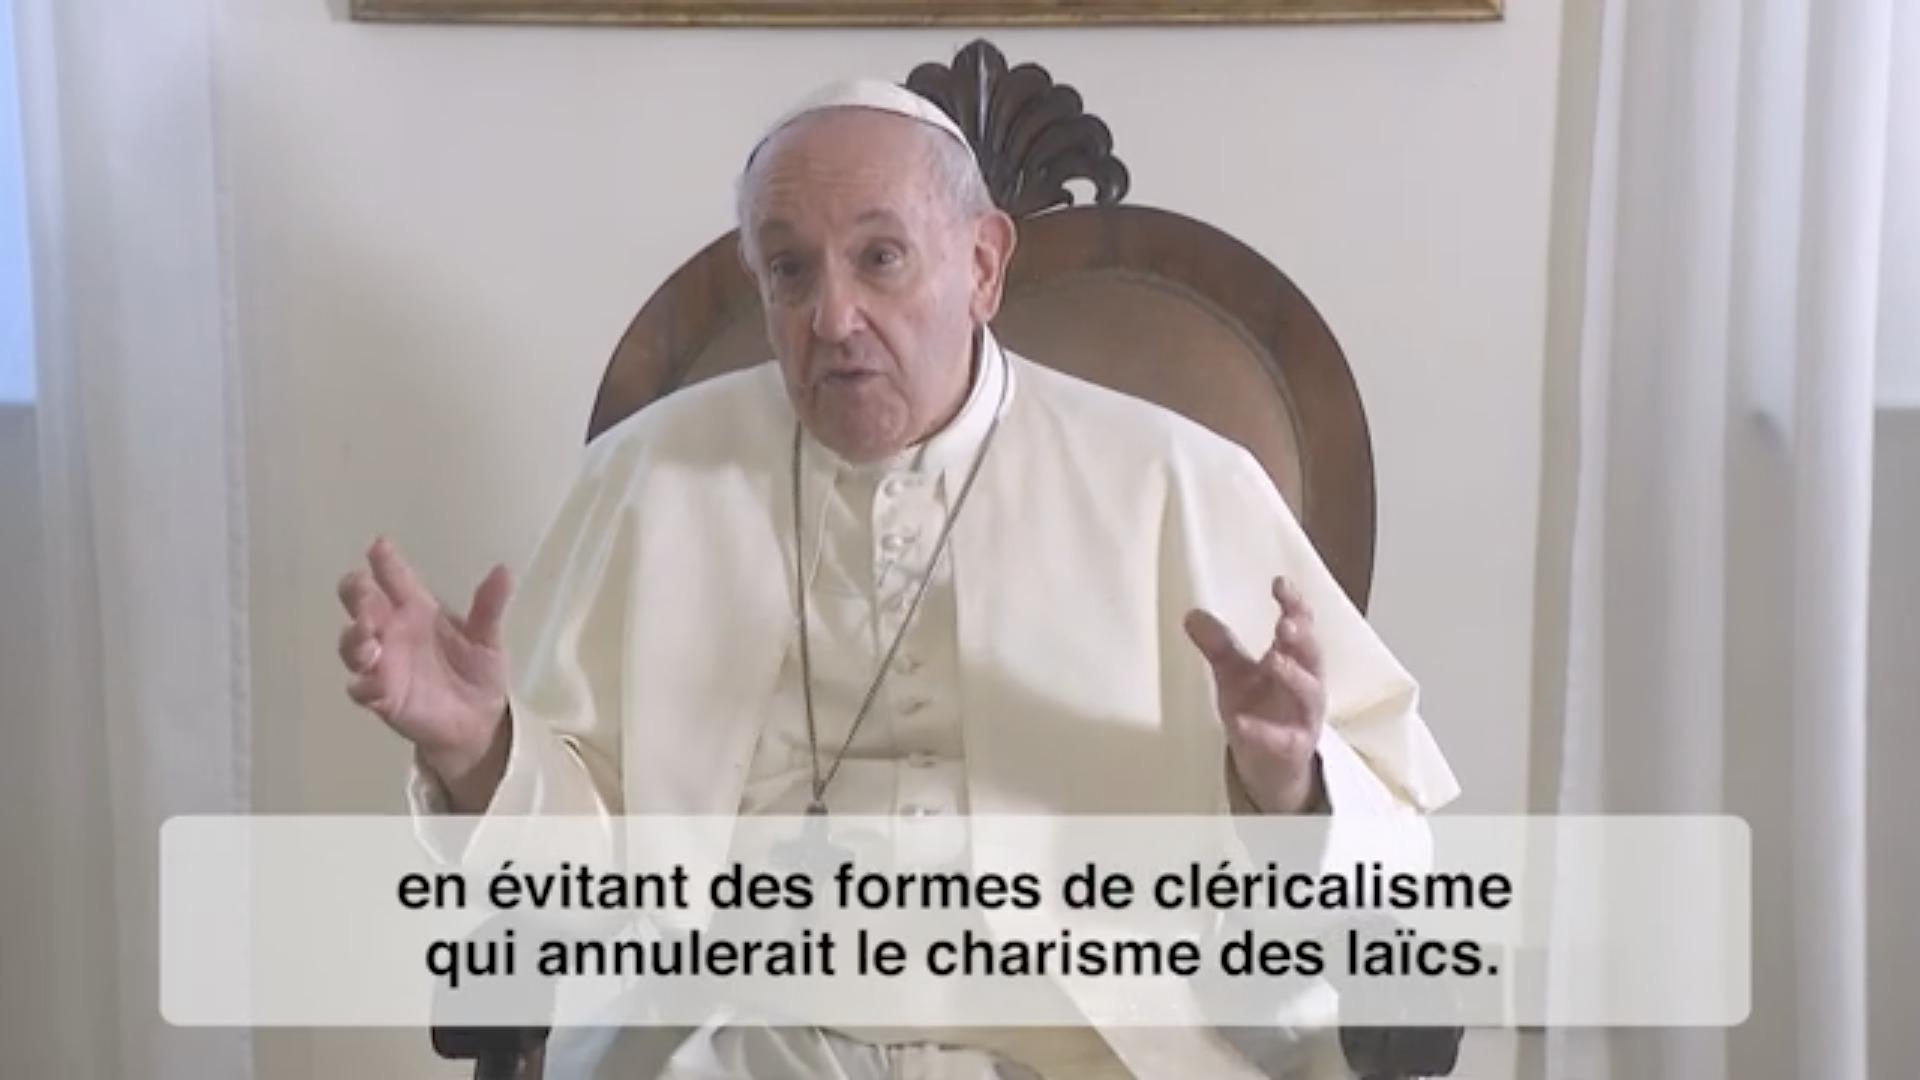 La vidéo du pape, octobre 2020, capture @ RMPP